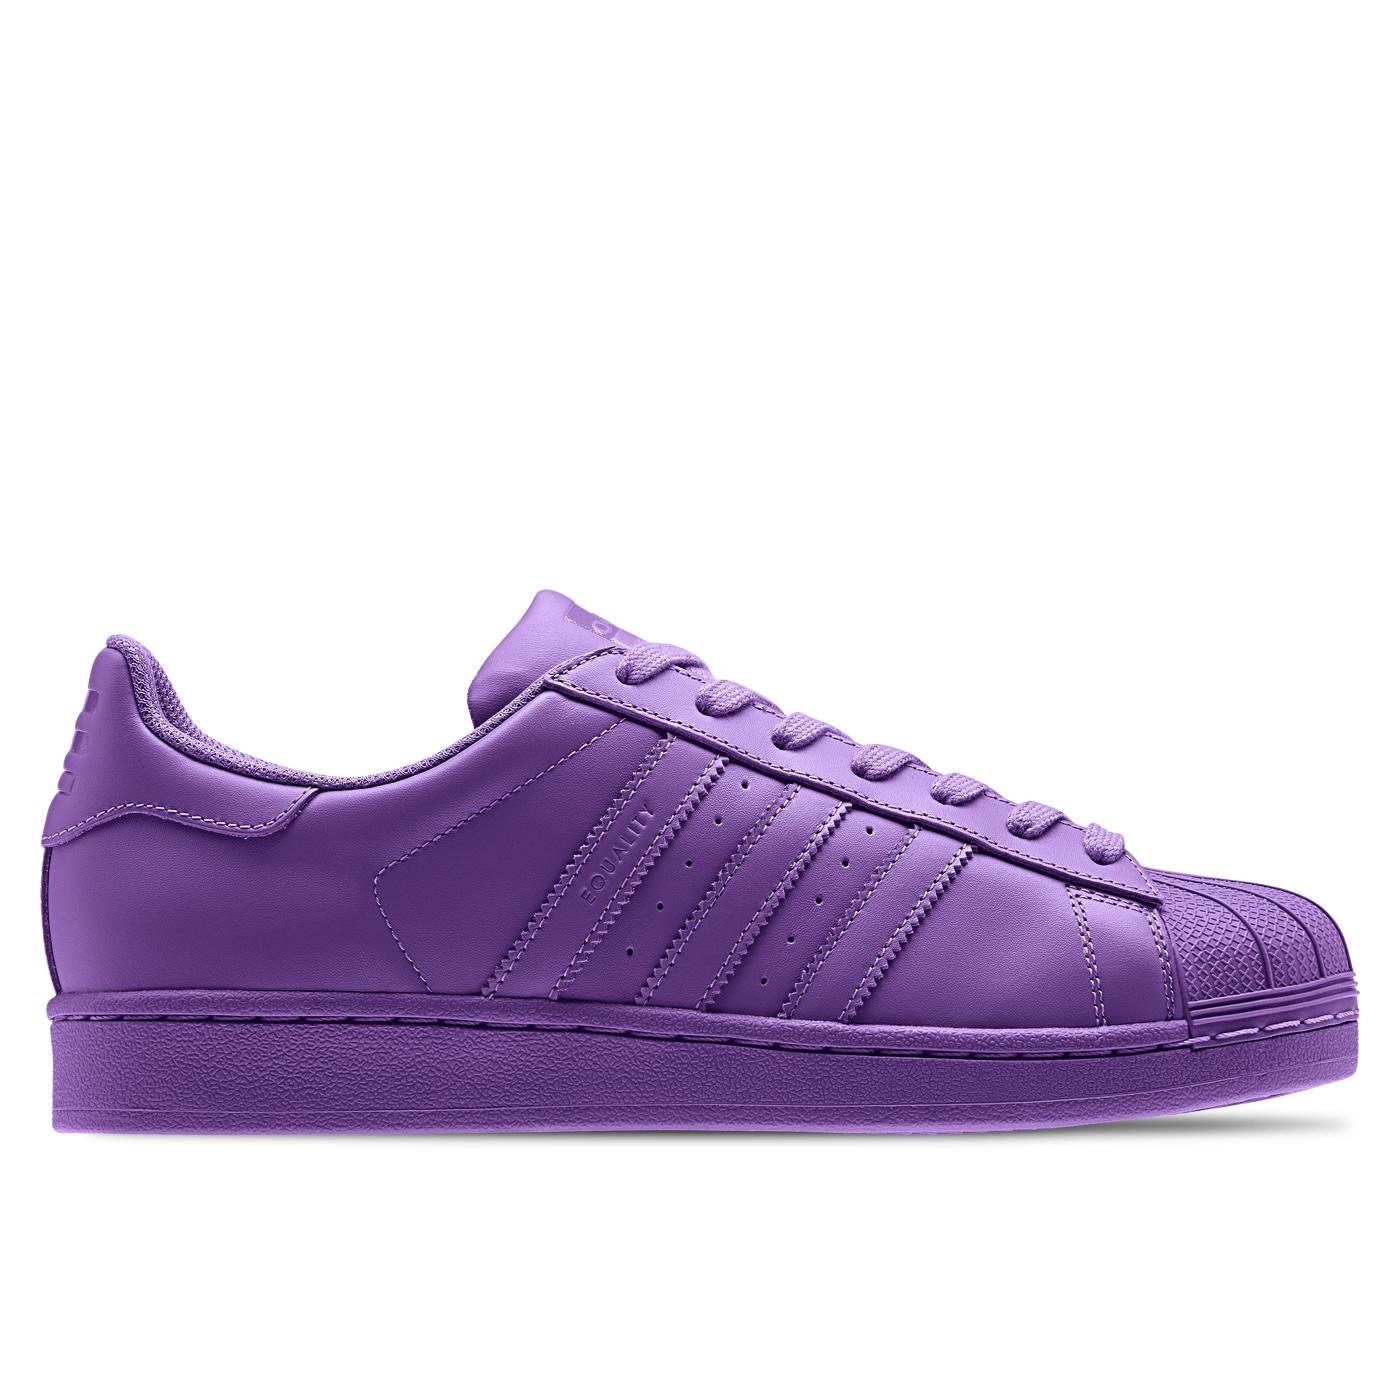 cheap for discount bc6c0 3d0ac adidas x Pharrell Williams Superstar Supercolor Purple - UEBERVART